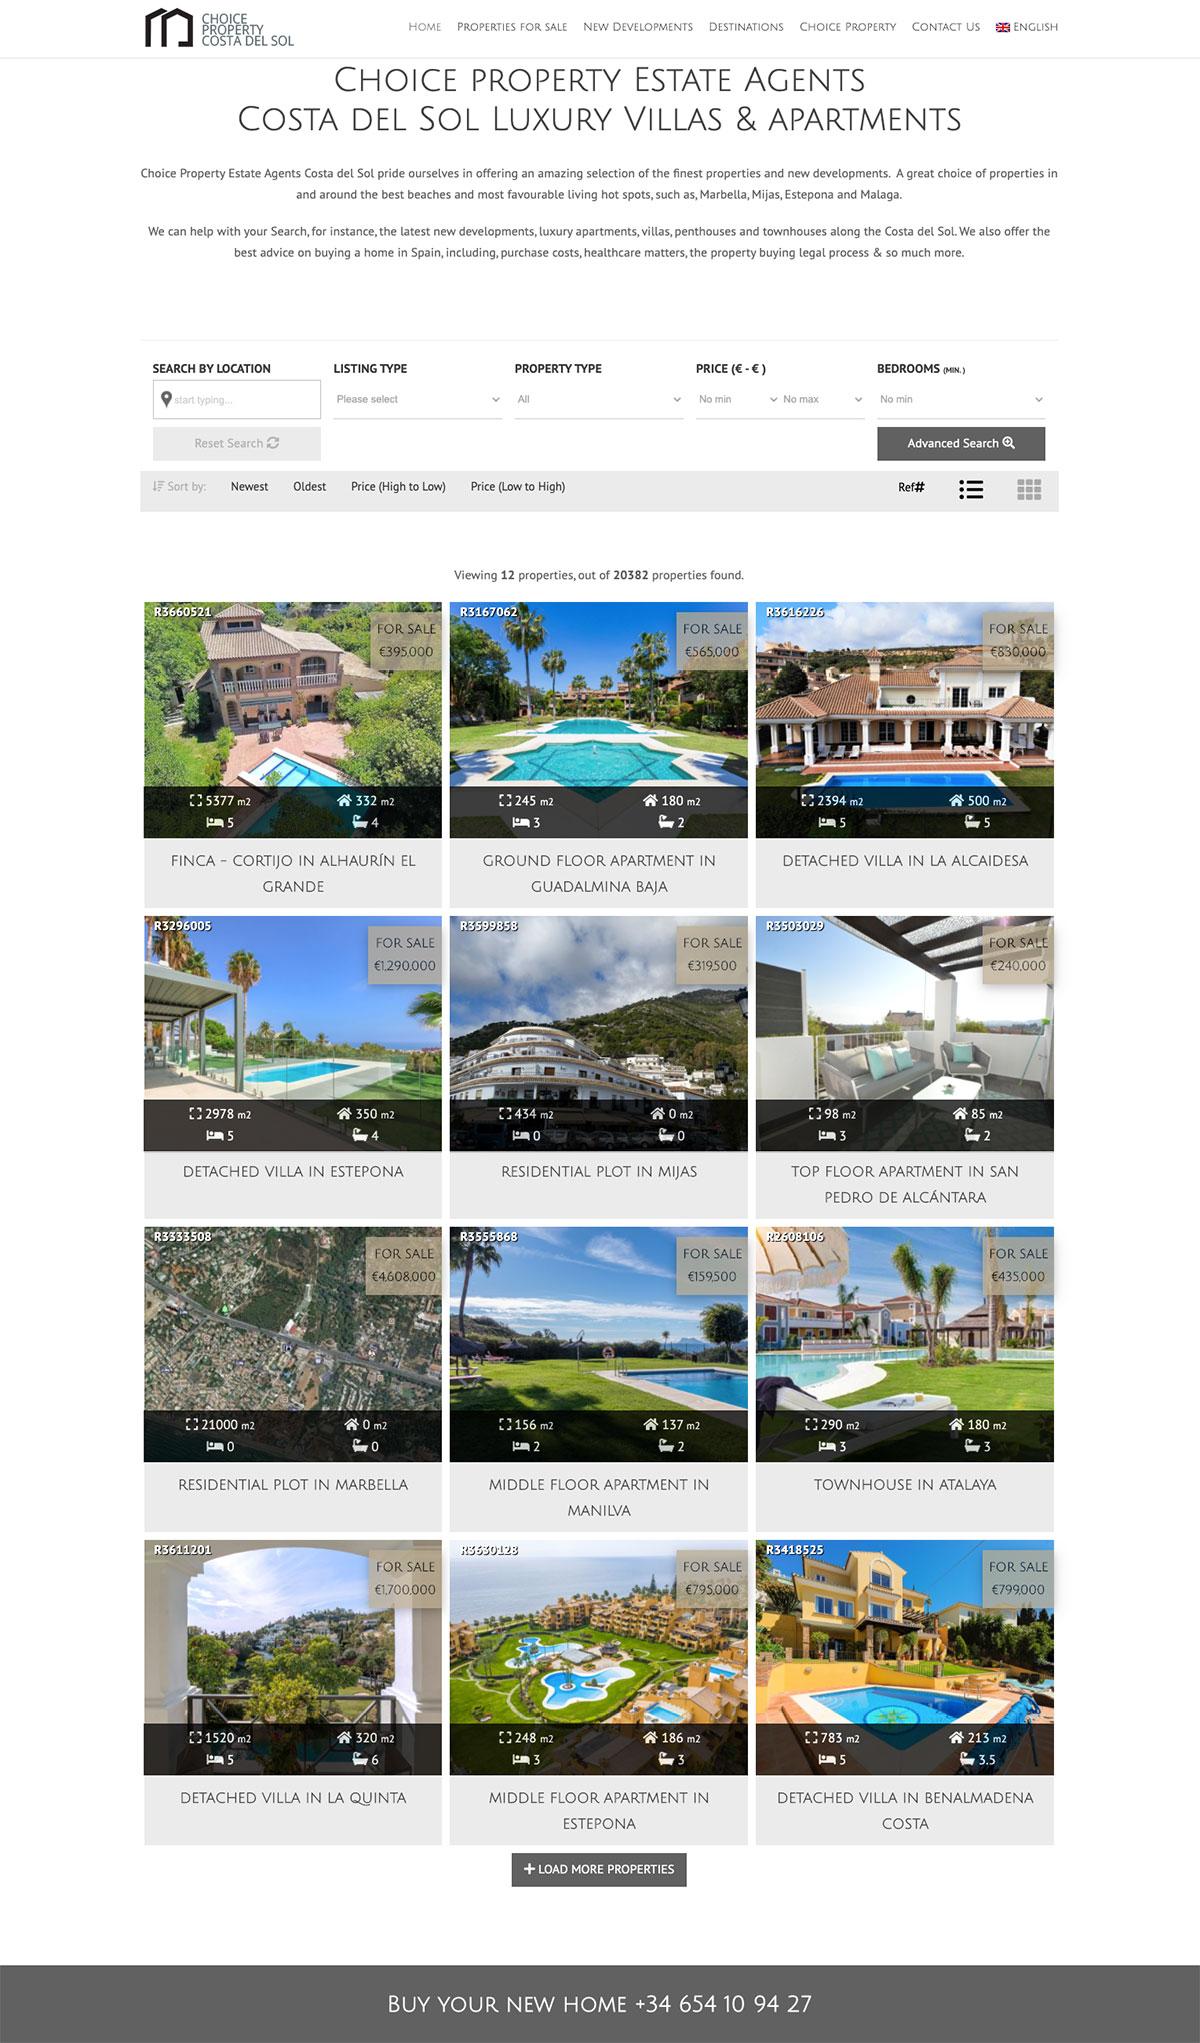 resales online property wordpress plugin multilingual search website marbella